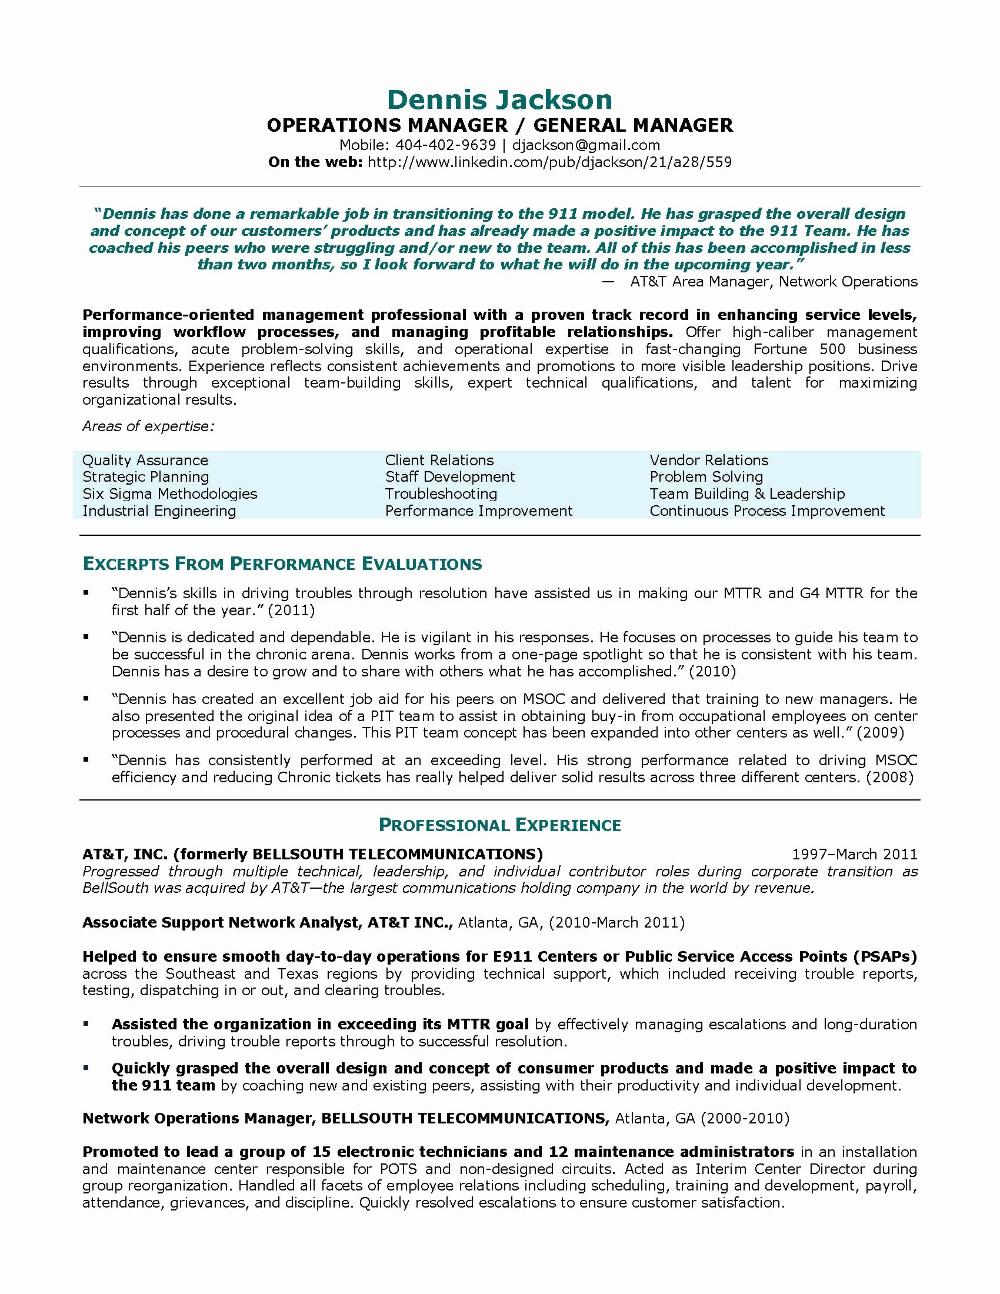 Sample Resume For Operations Manager In Bpo Valid Construction For Operations Manager Report Template Job Resume Examples Manager Resume Operations Management